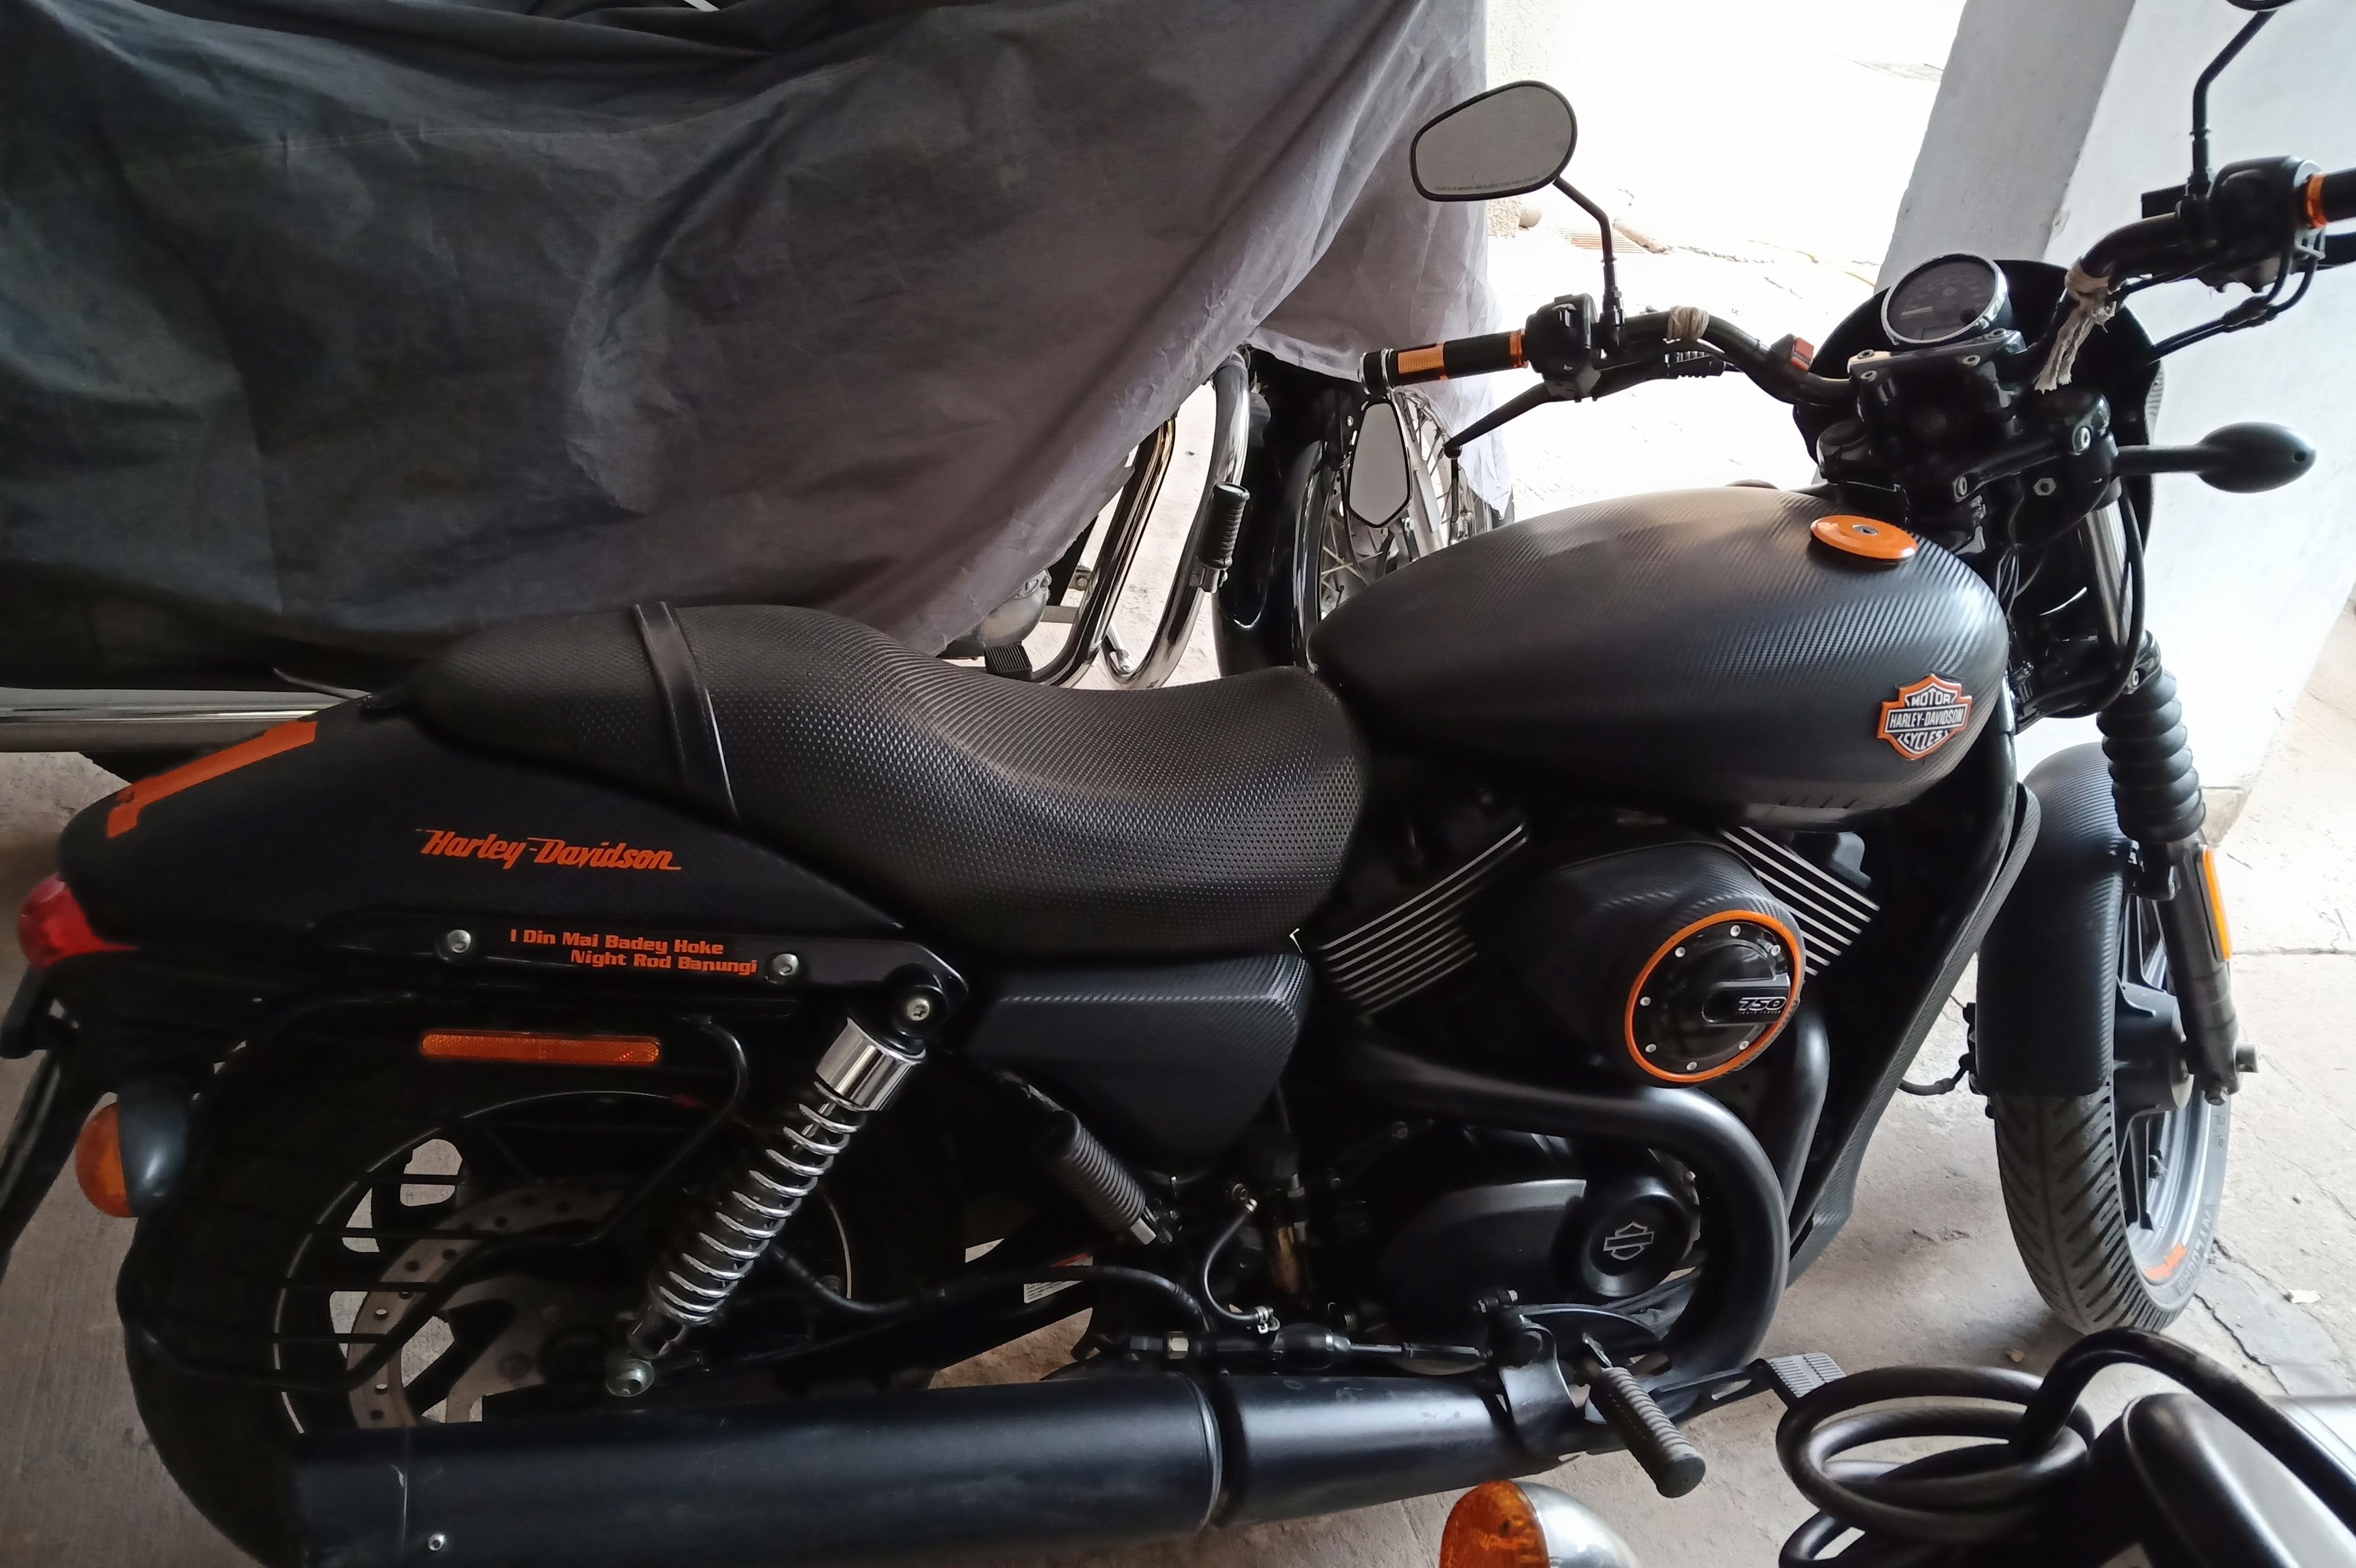 2015 Harley Davidson Street 750 STD